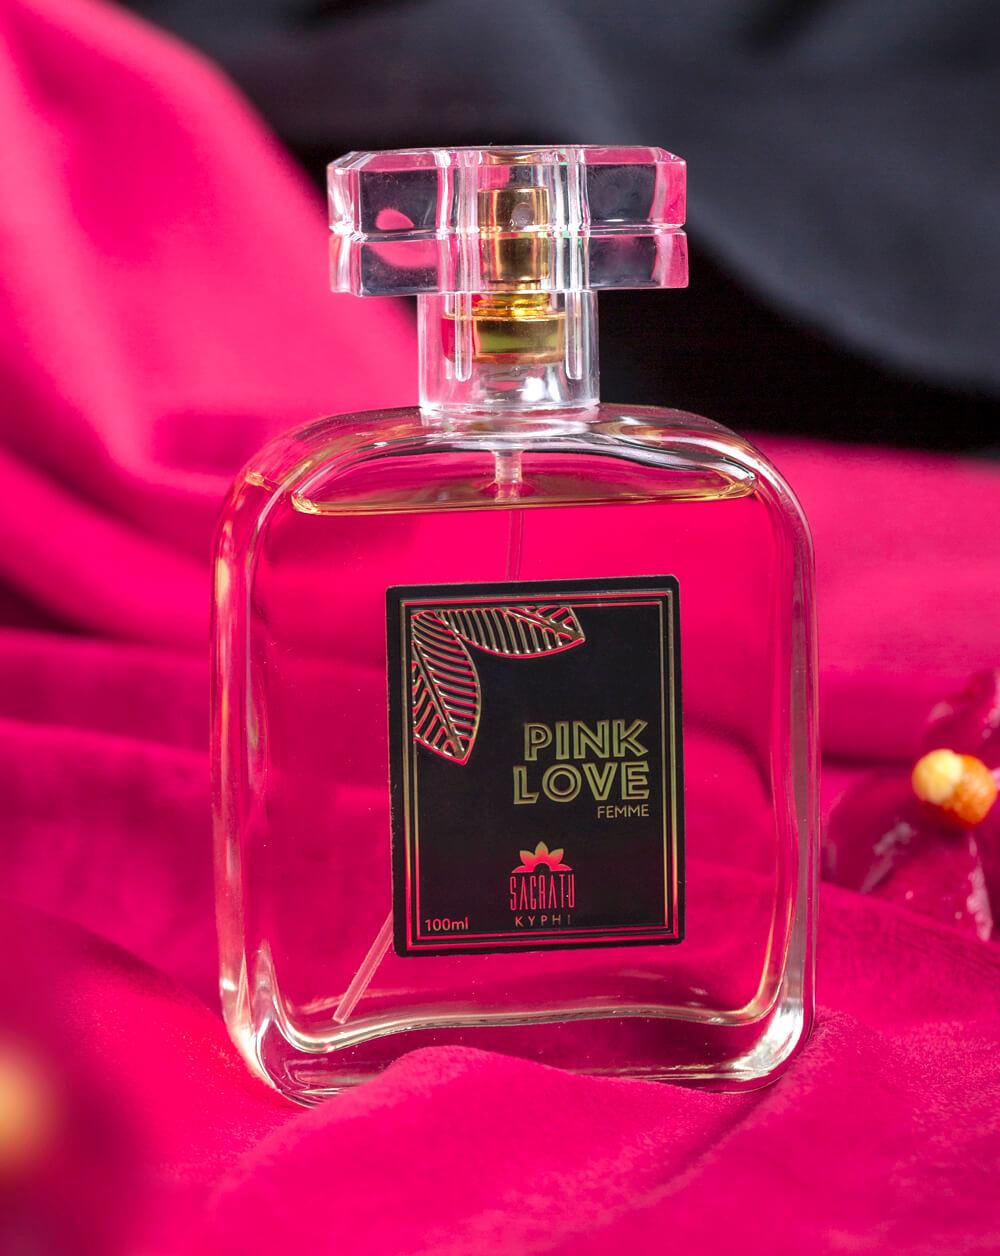 PINK LOVE inspirado em Good Girl Fantastic Pink by Carolina Herrera